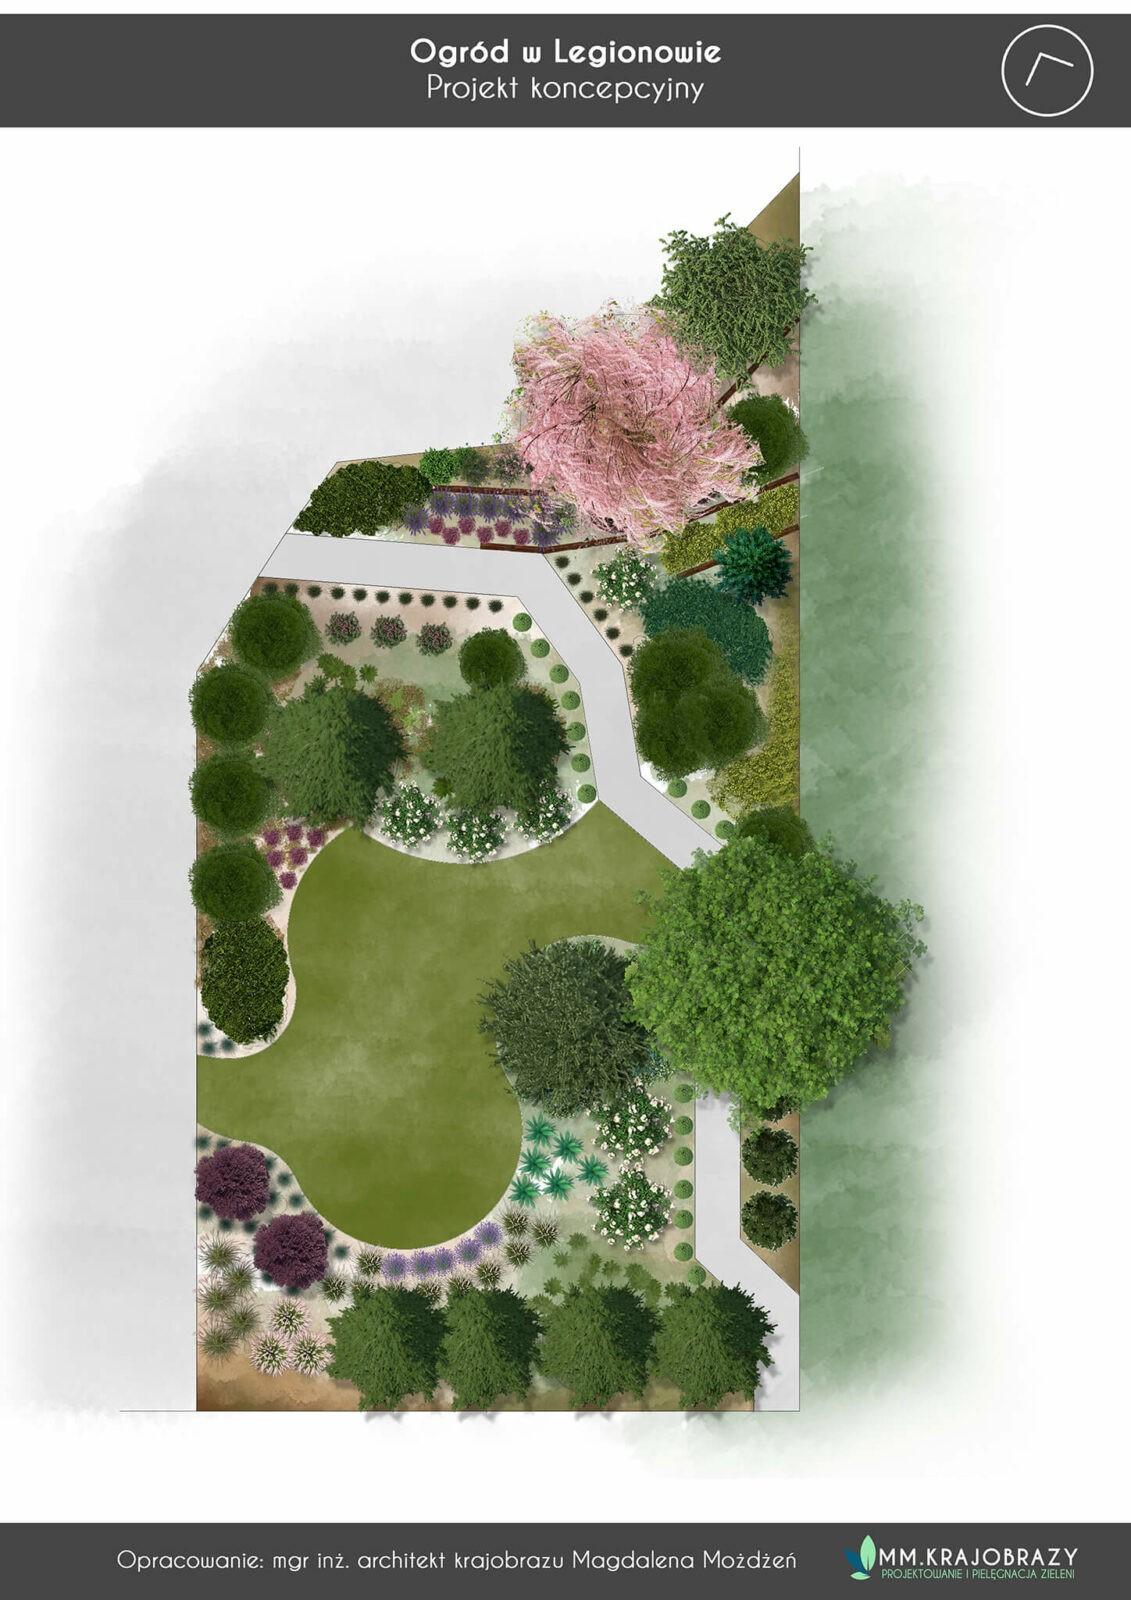 Projekt Ogrodu Legionowo